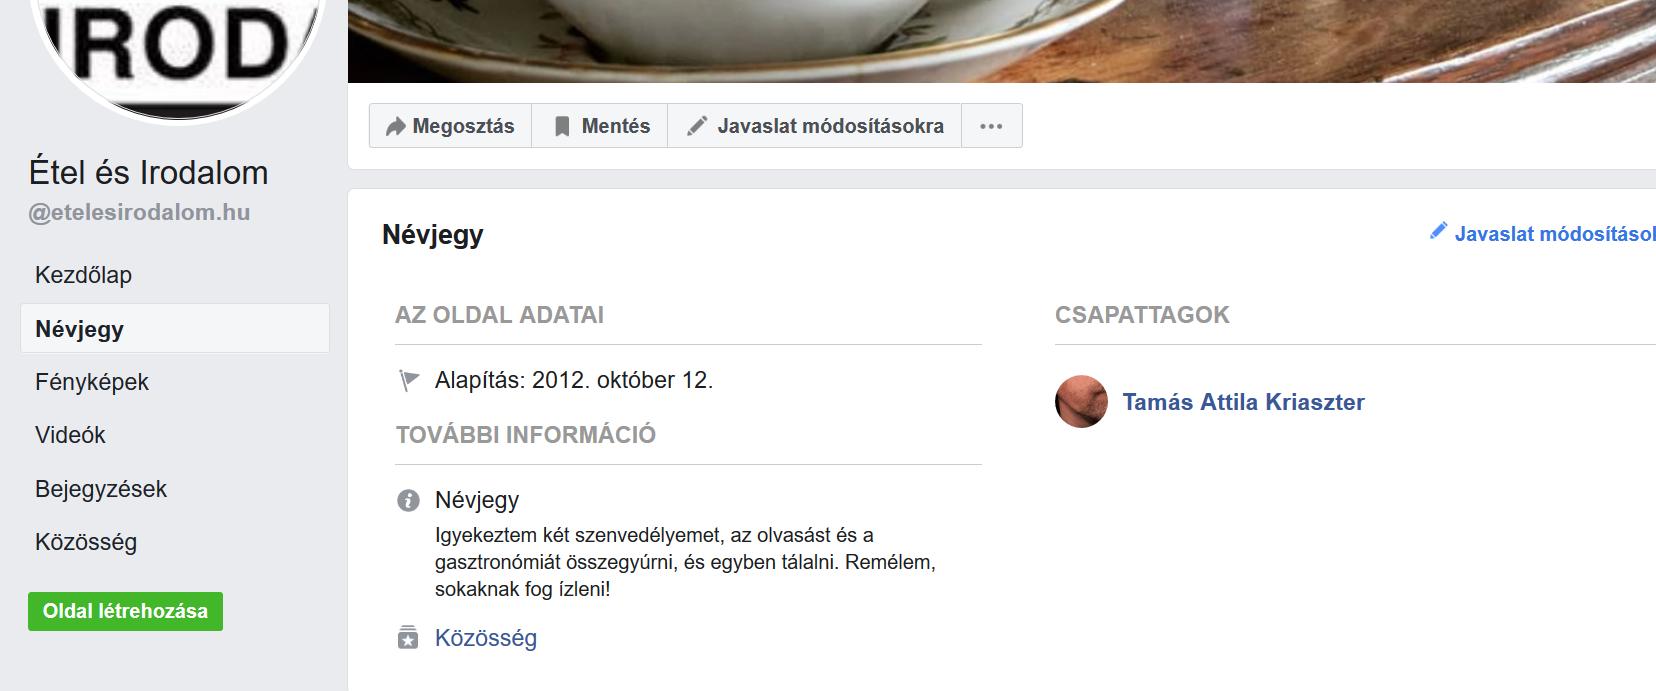 screenshot_2020-03-10_etel_es_irodalom_nevjegy.png